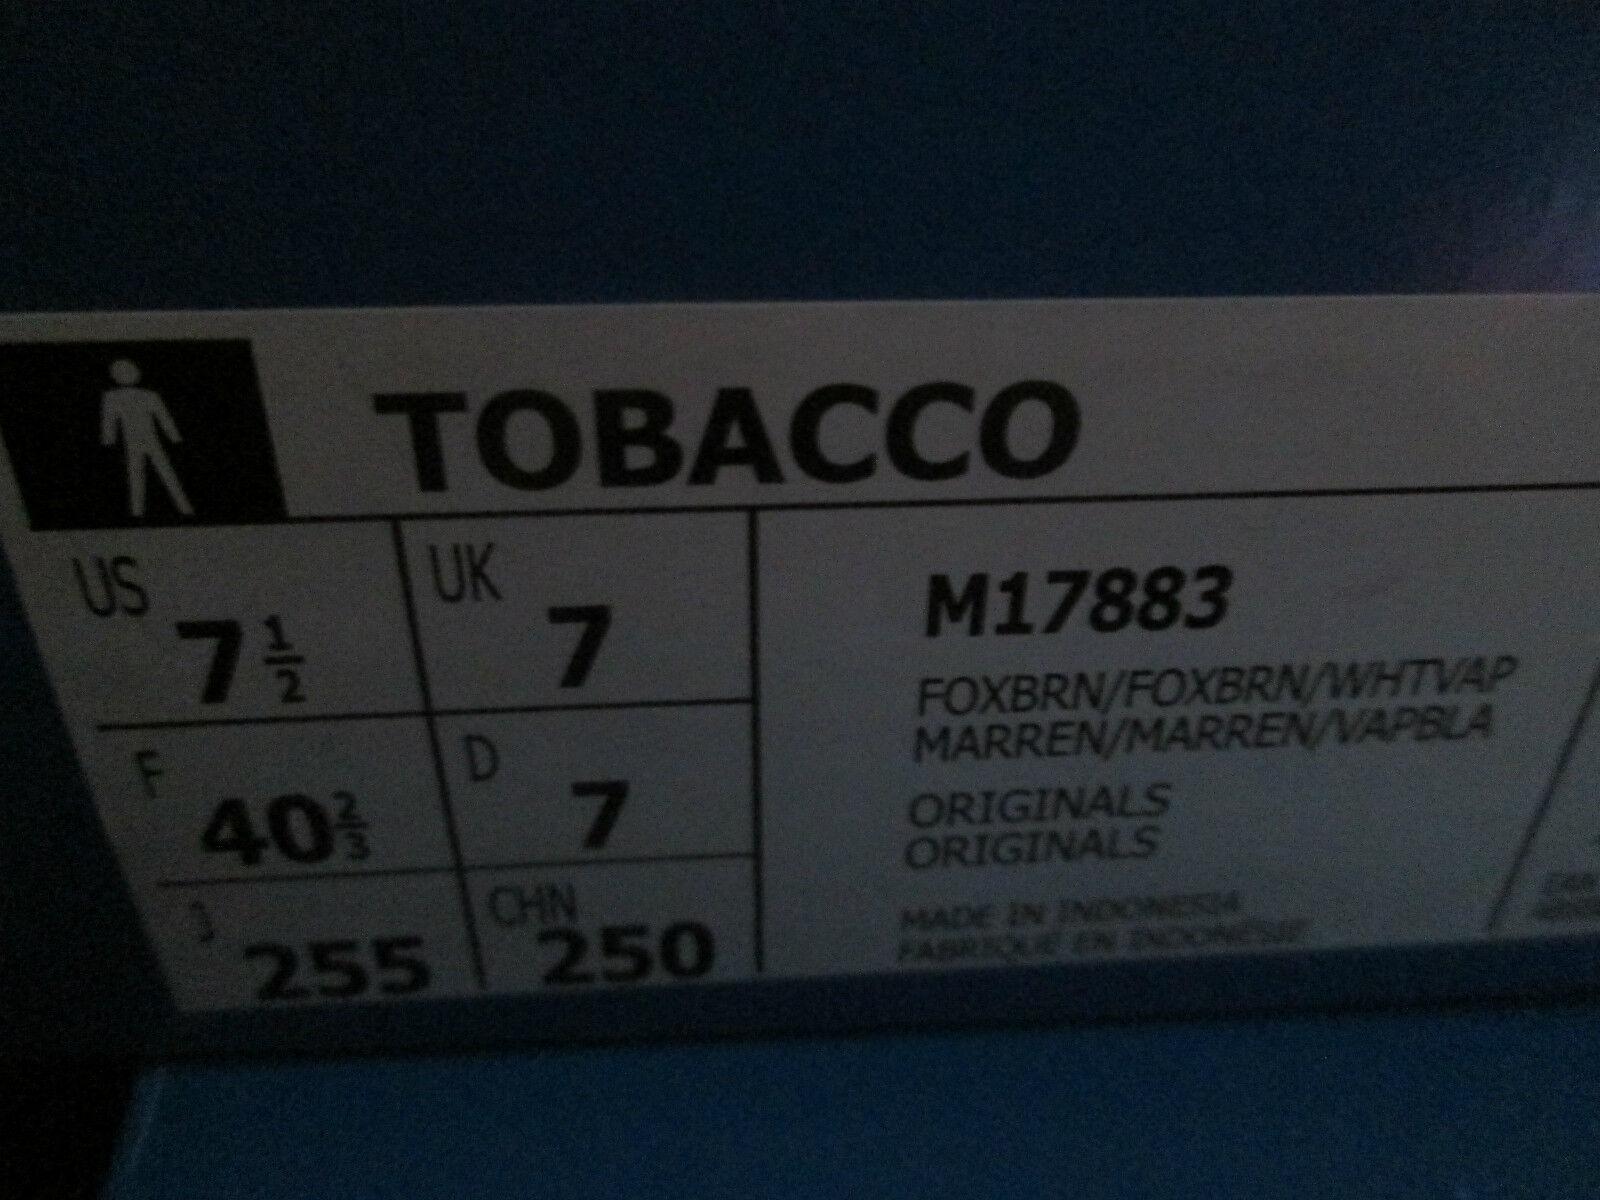 NEW ADIDAS TOBACCO M17883   Herren BOYS TRAINERS UK BNIB SIZE 6 6.5 7 BNIB UK FOX BROWN 956823